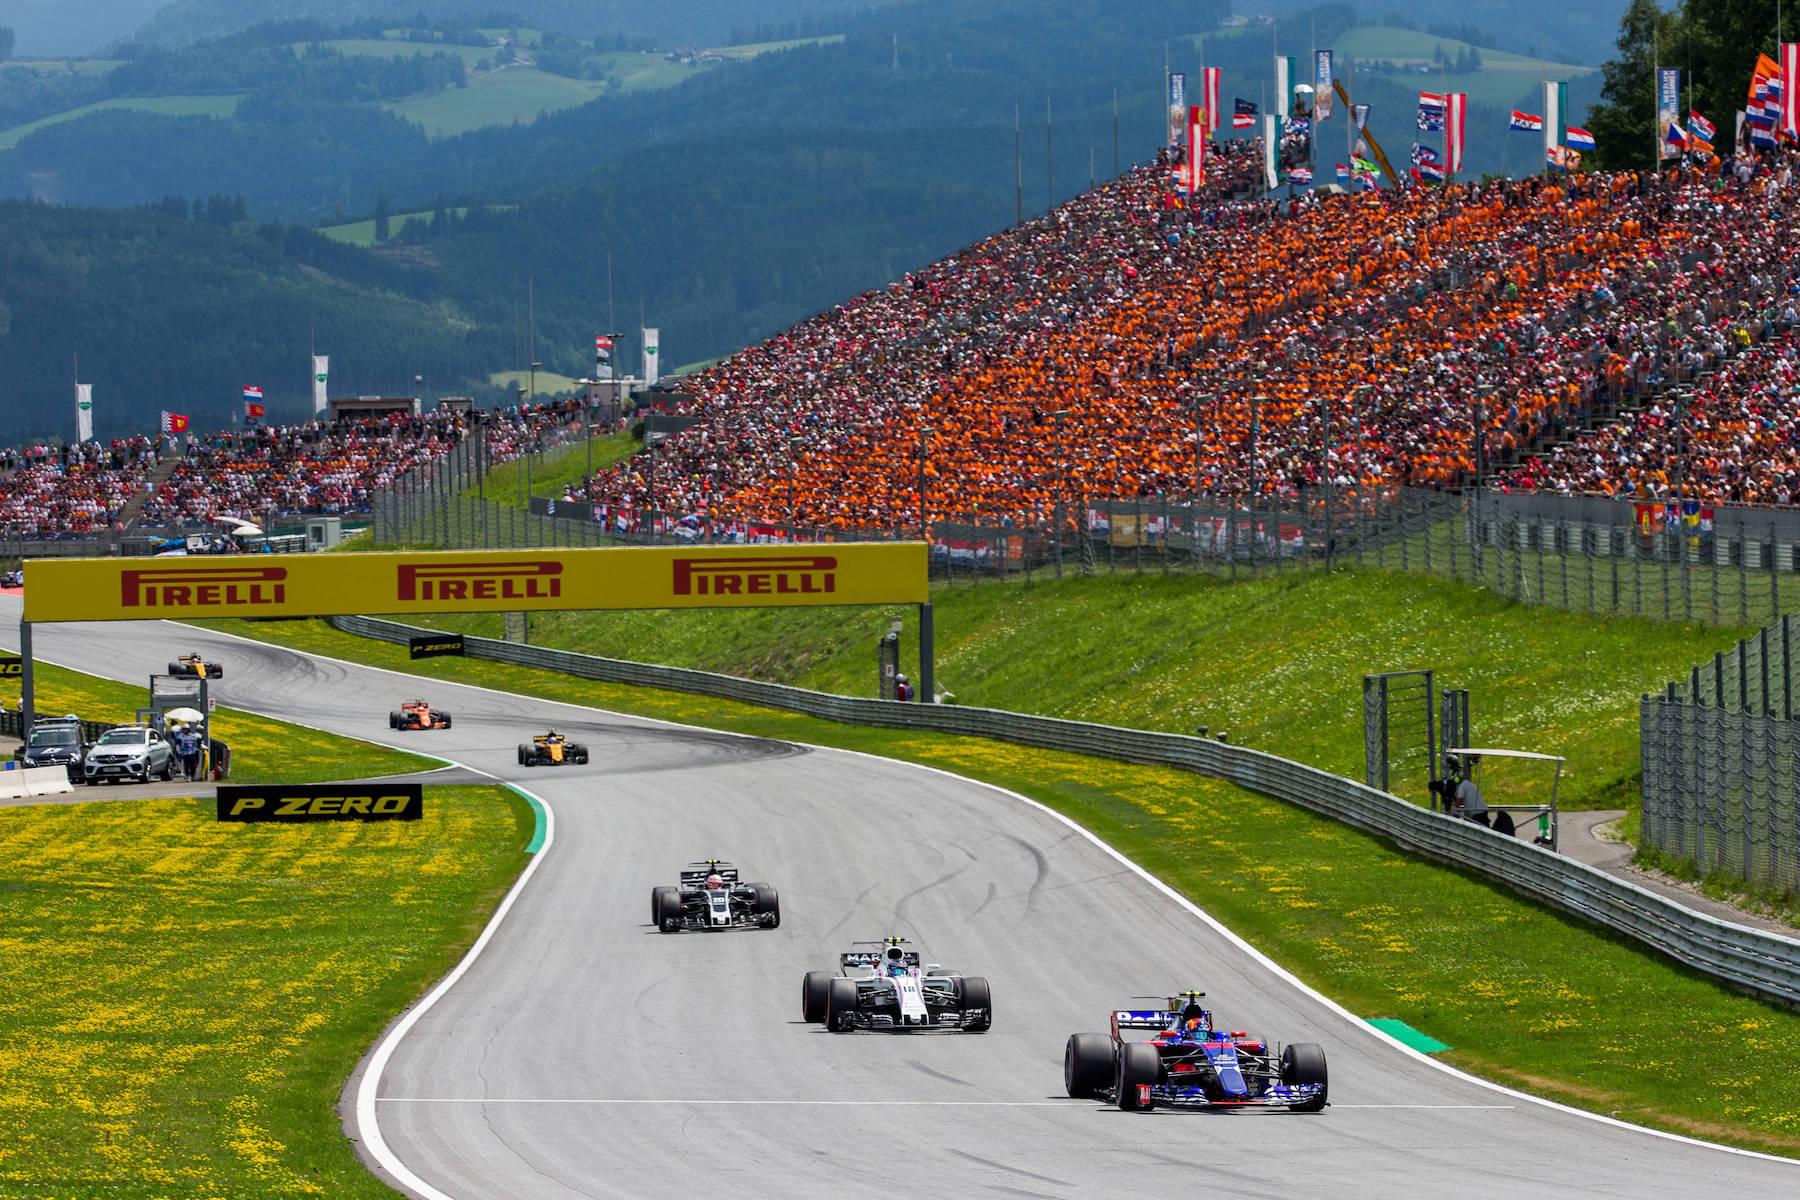 D 2017 Daniil Kvyat | Toro Rosso STR12 | 2017 Austrian GP 1 copy.jpg